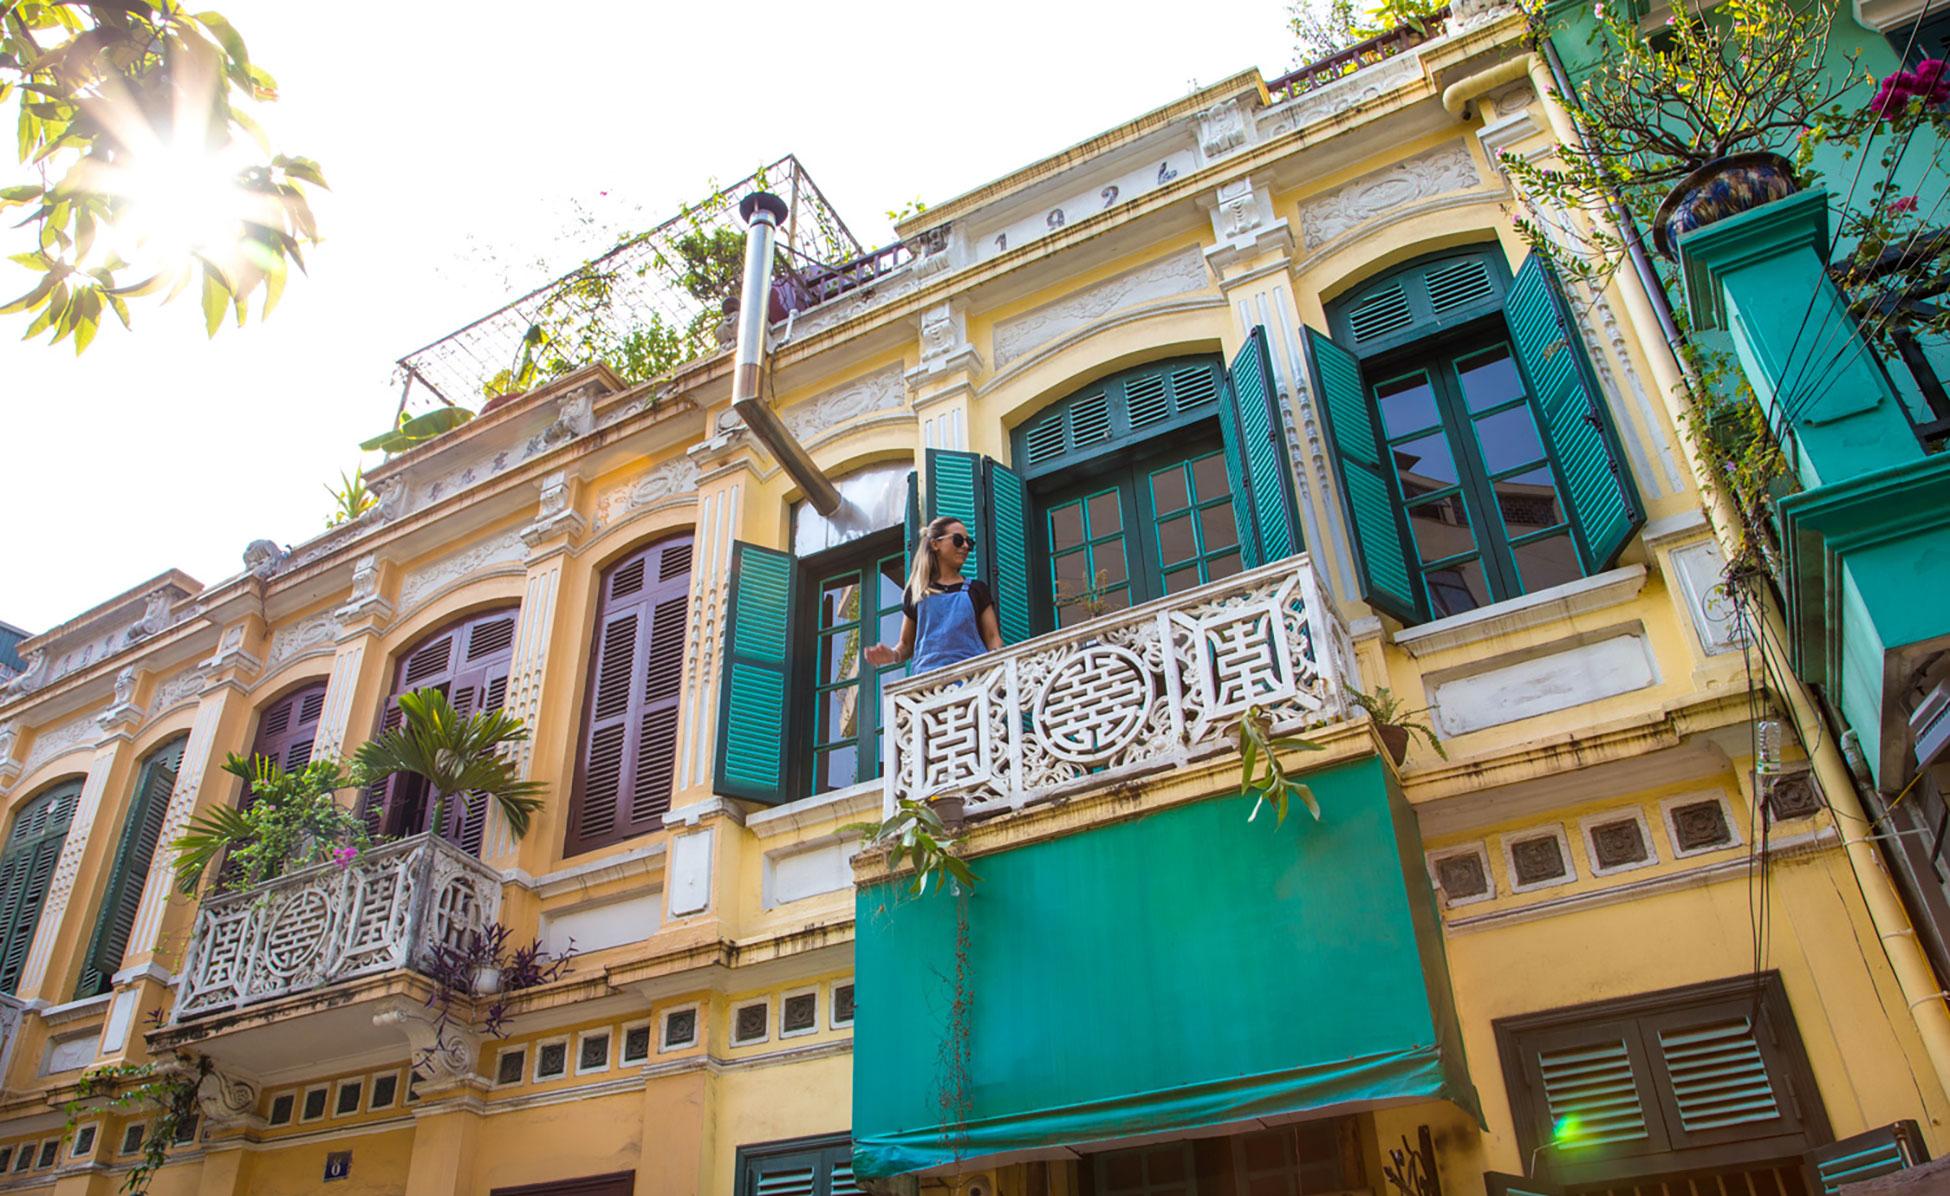 The Hanoi Social Club - Top Restaurant to Try In Hanoi